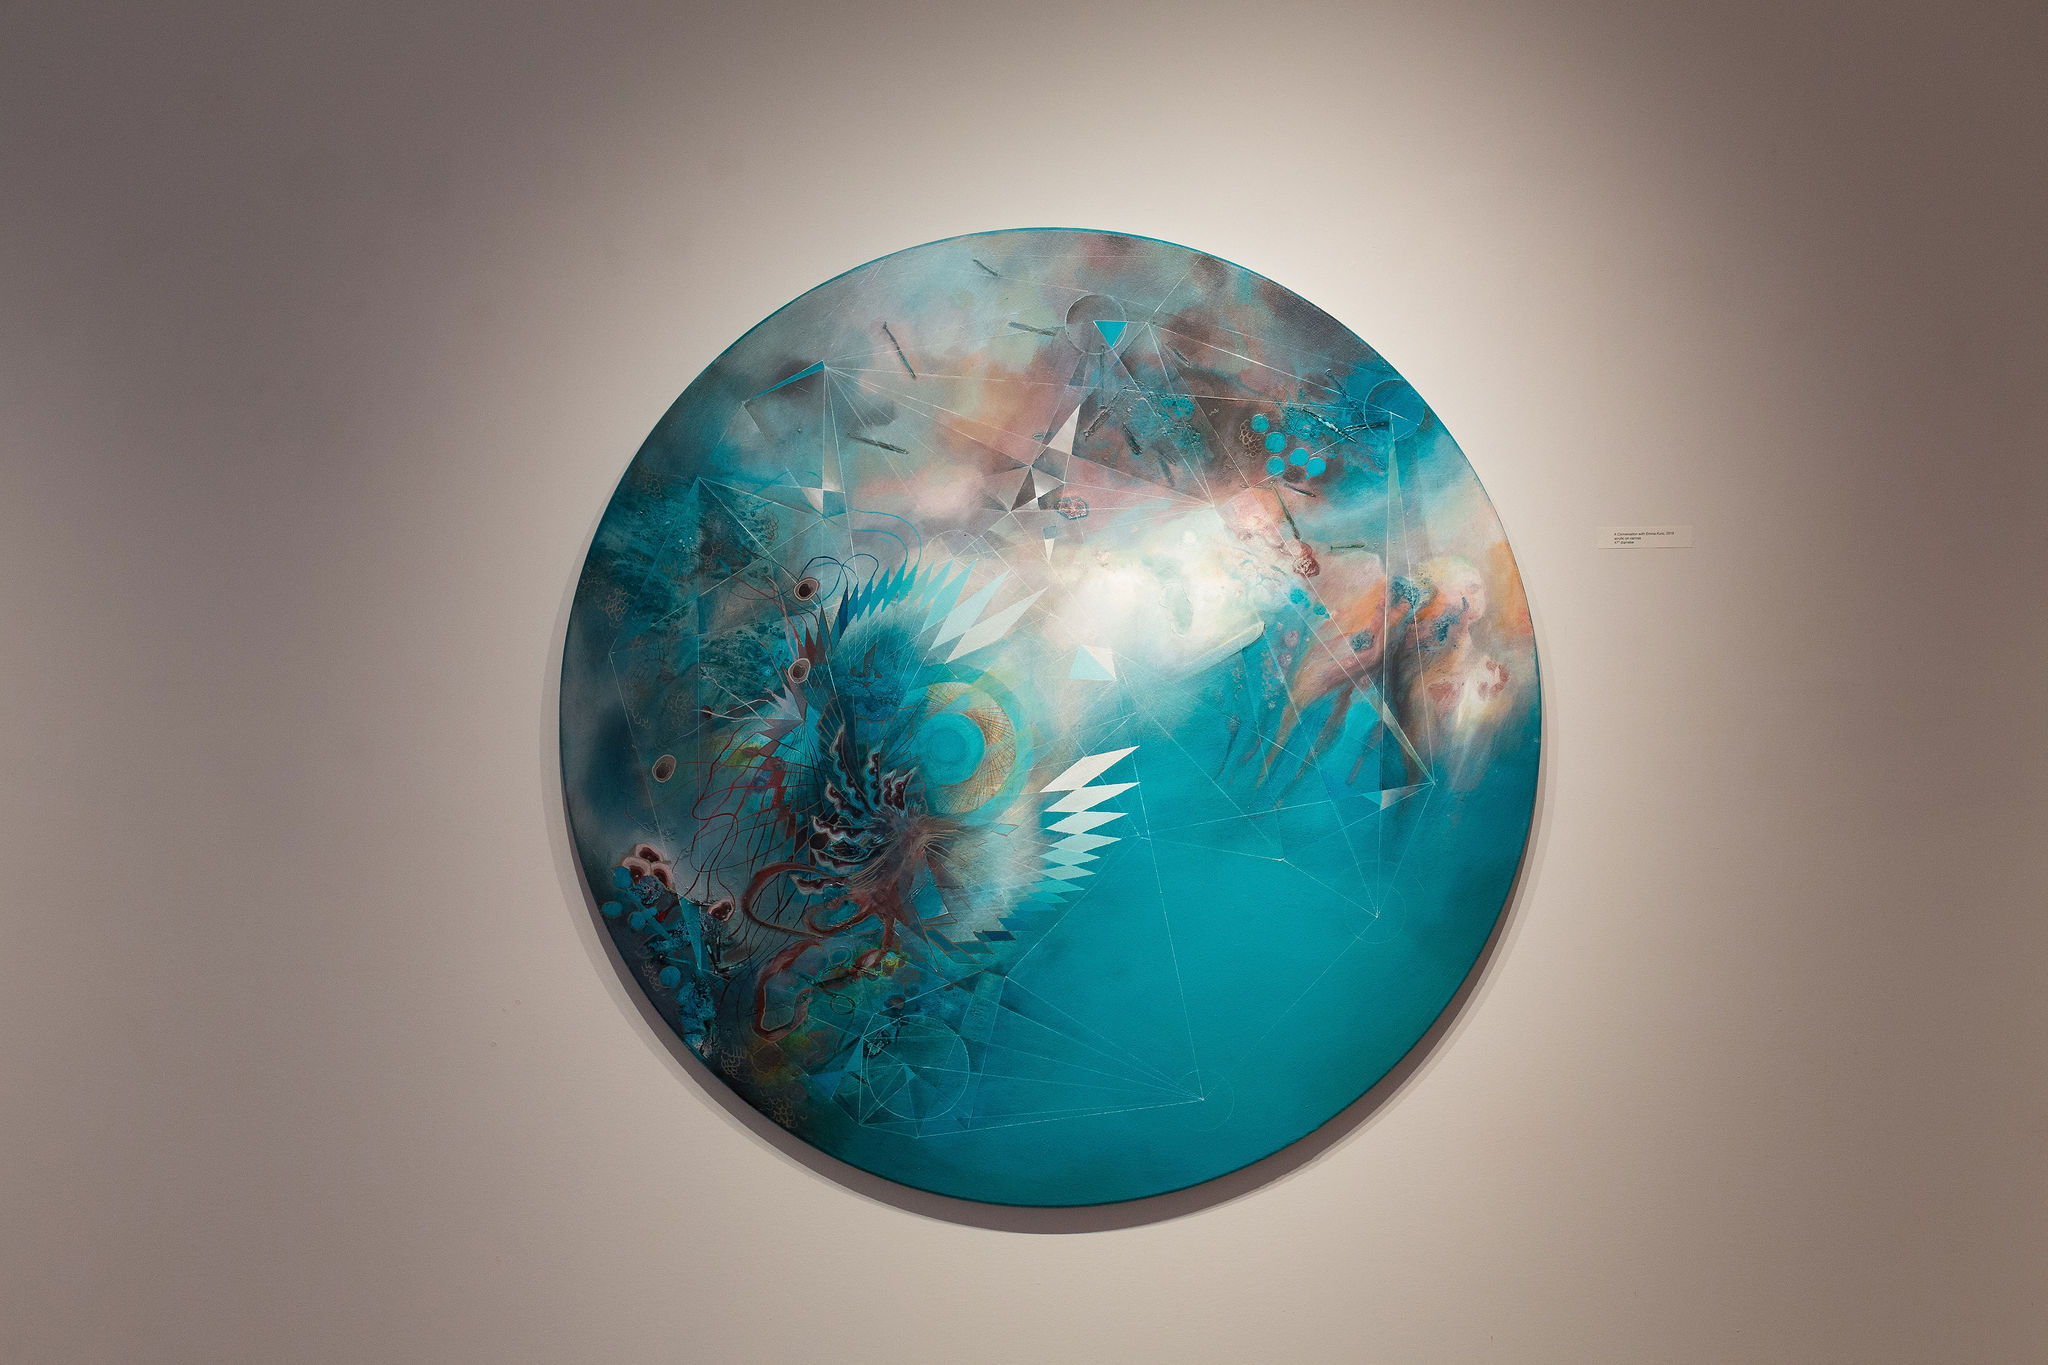 """A Conversation with Emma Kunz"", Acrylic on Canvas, 47"" Tondo, 2019"